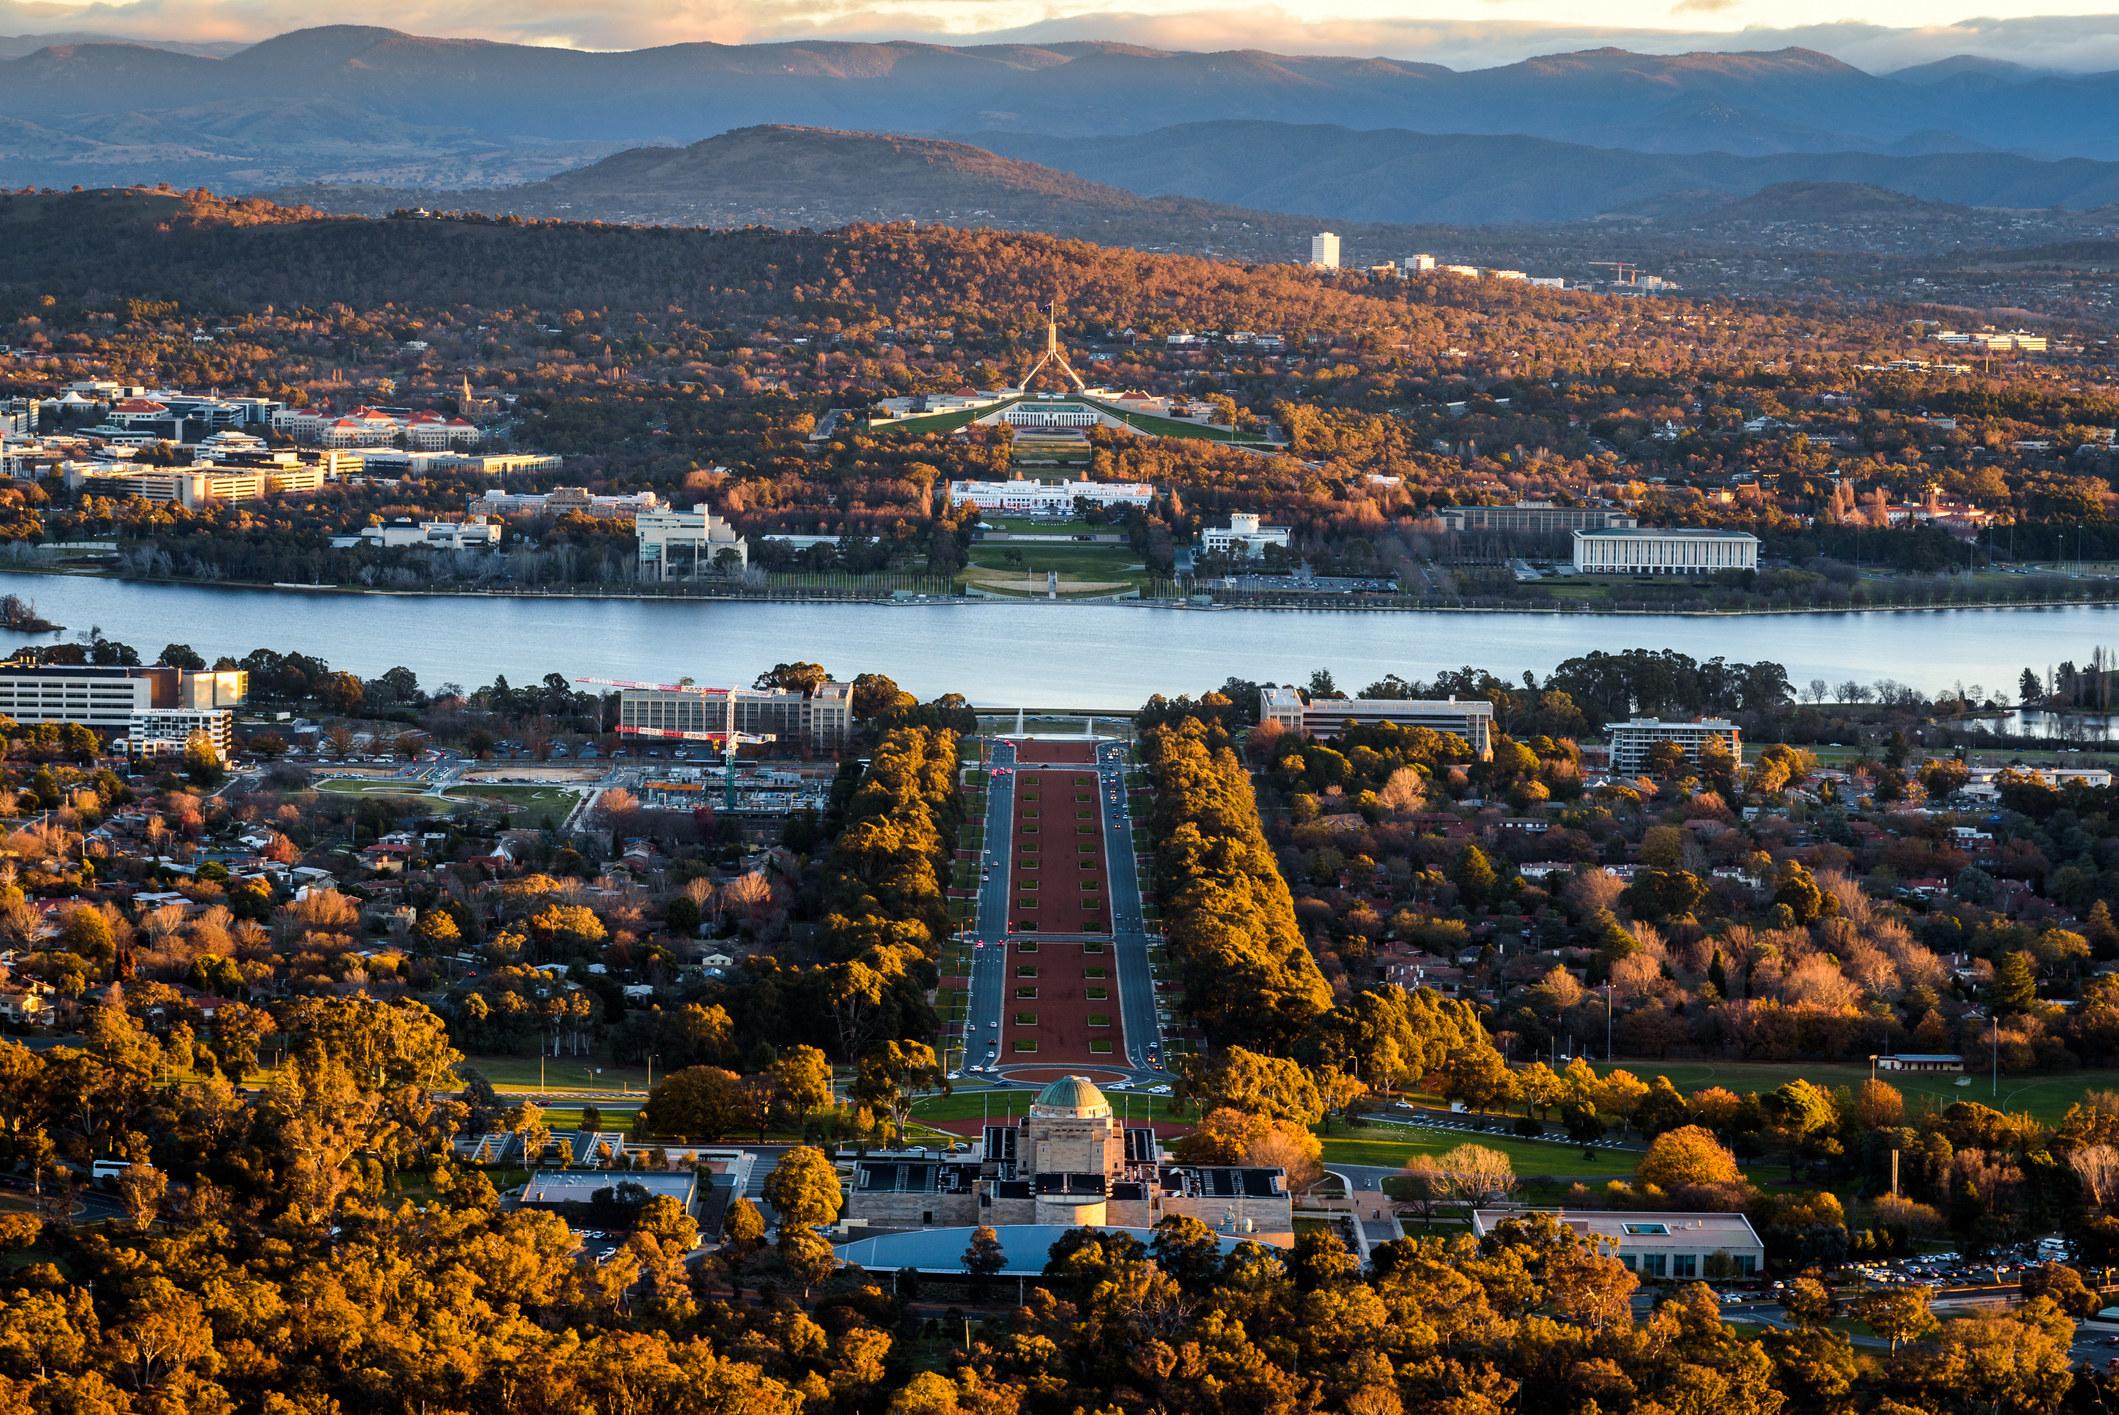 Canberra, Australia's capital city